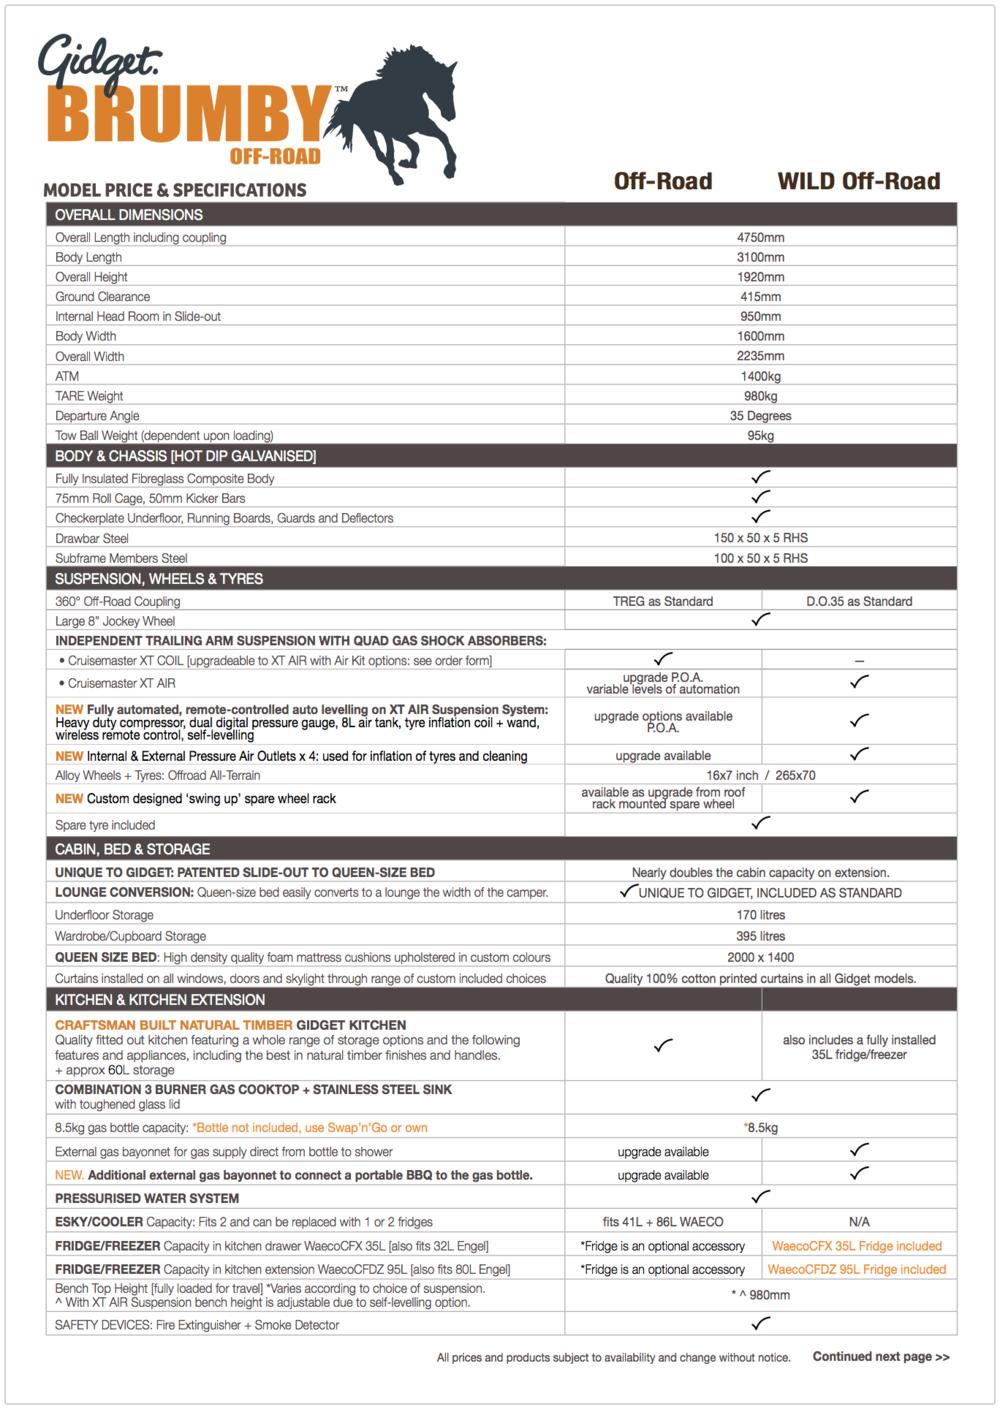 GIDGET BRUMBY MODELS SPECS & PRICE LIST